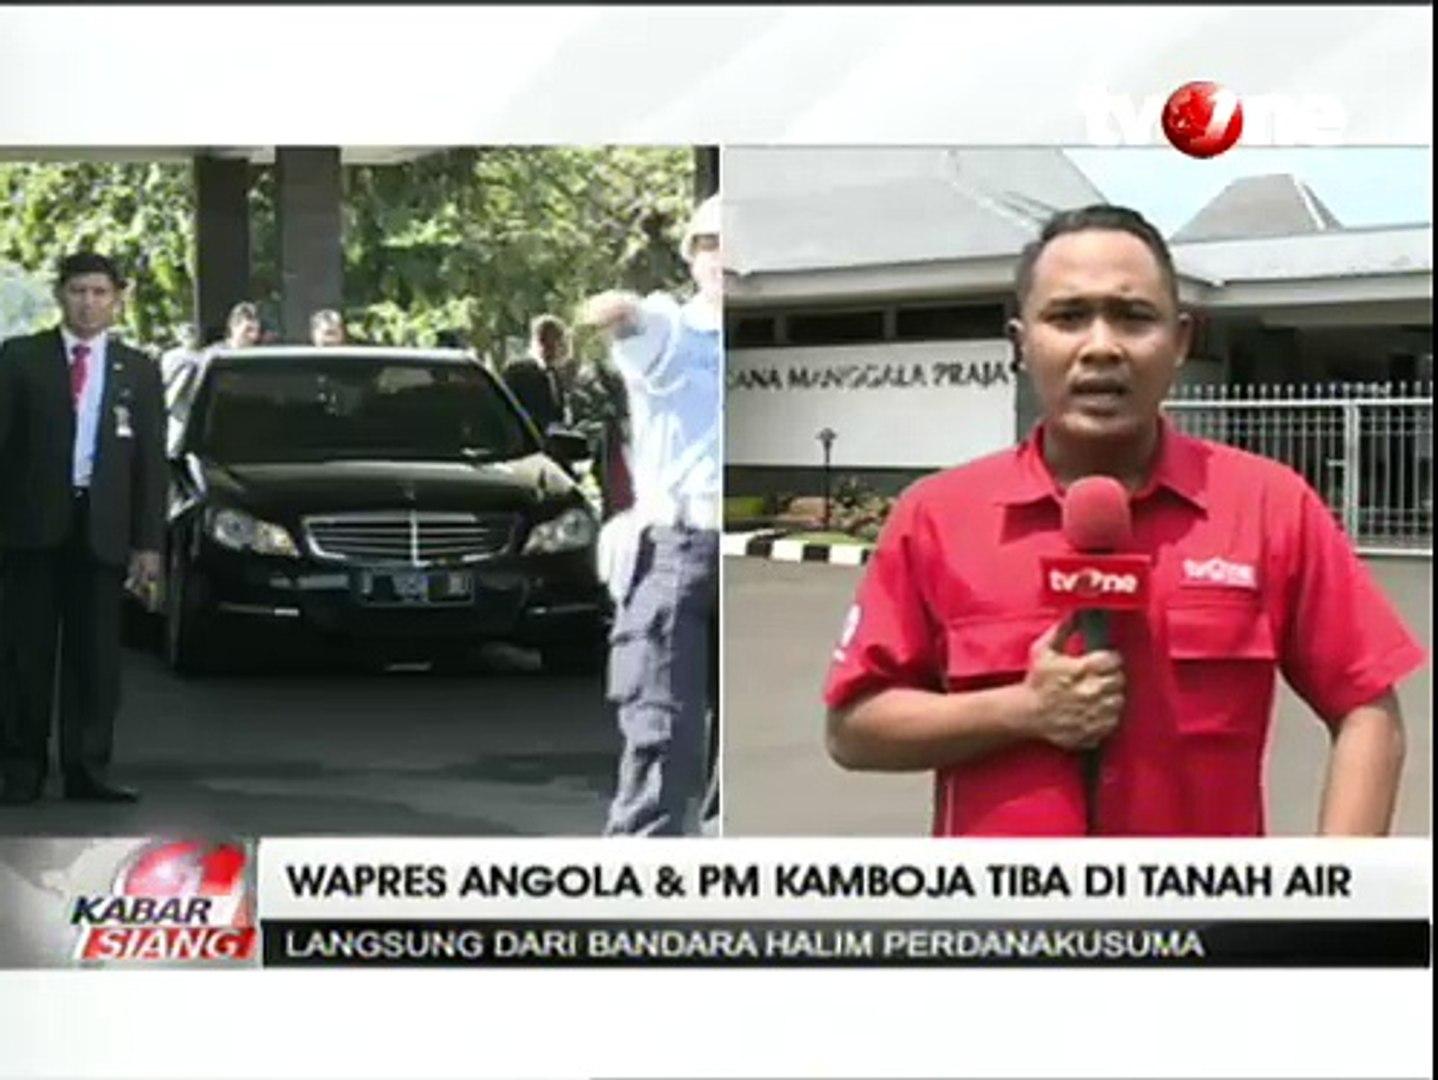 Wapres Angola dan PM Kamboja Tiba di Tanah Air